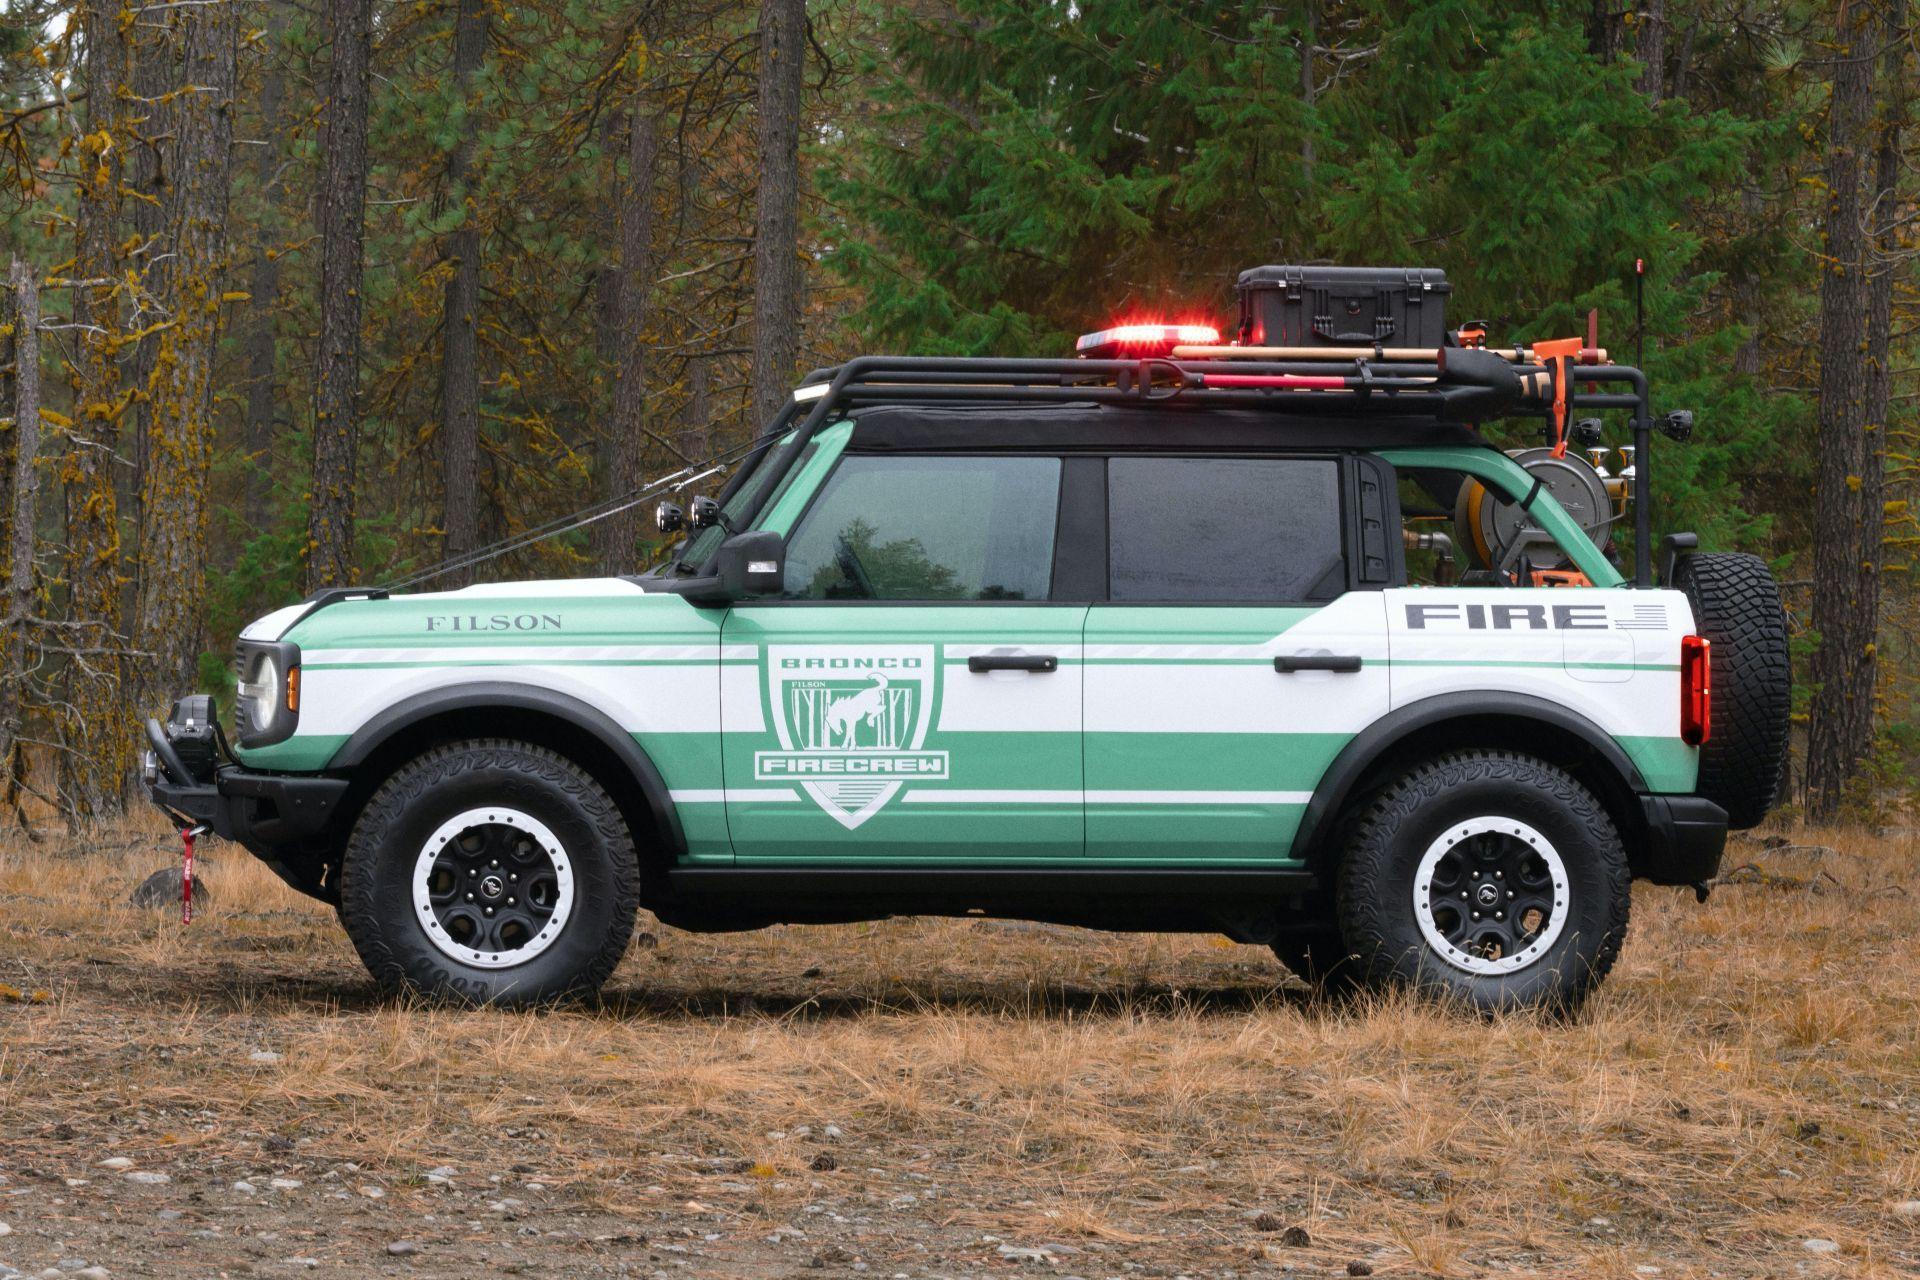 Ford-Bronco-Wildland-Fire-Rig-Concept-1